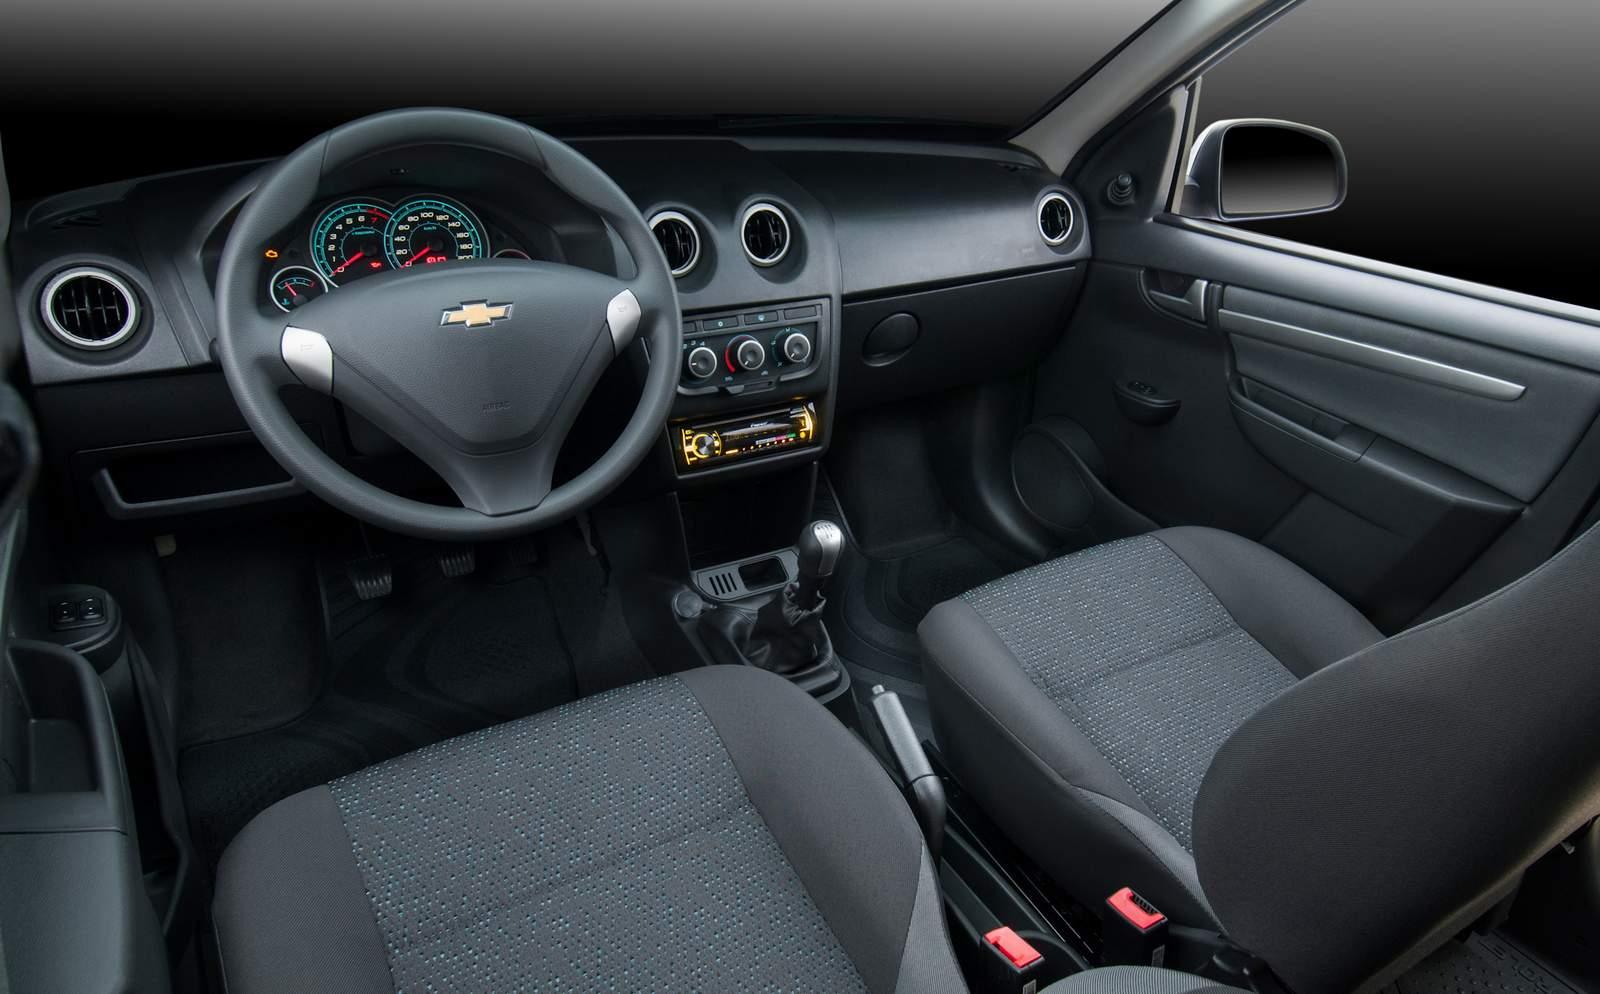 novo Chevrolet Celta 2014 - interior